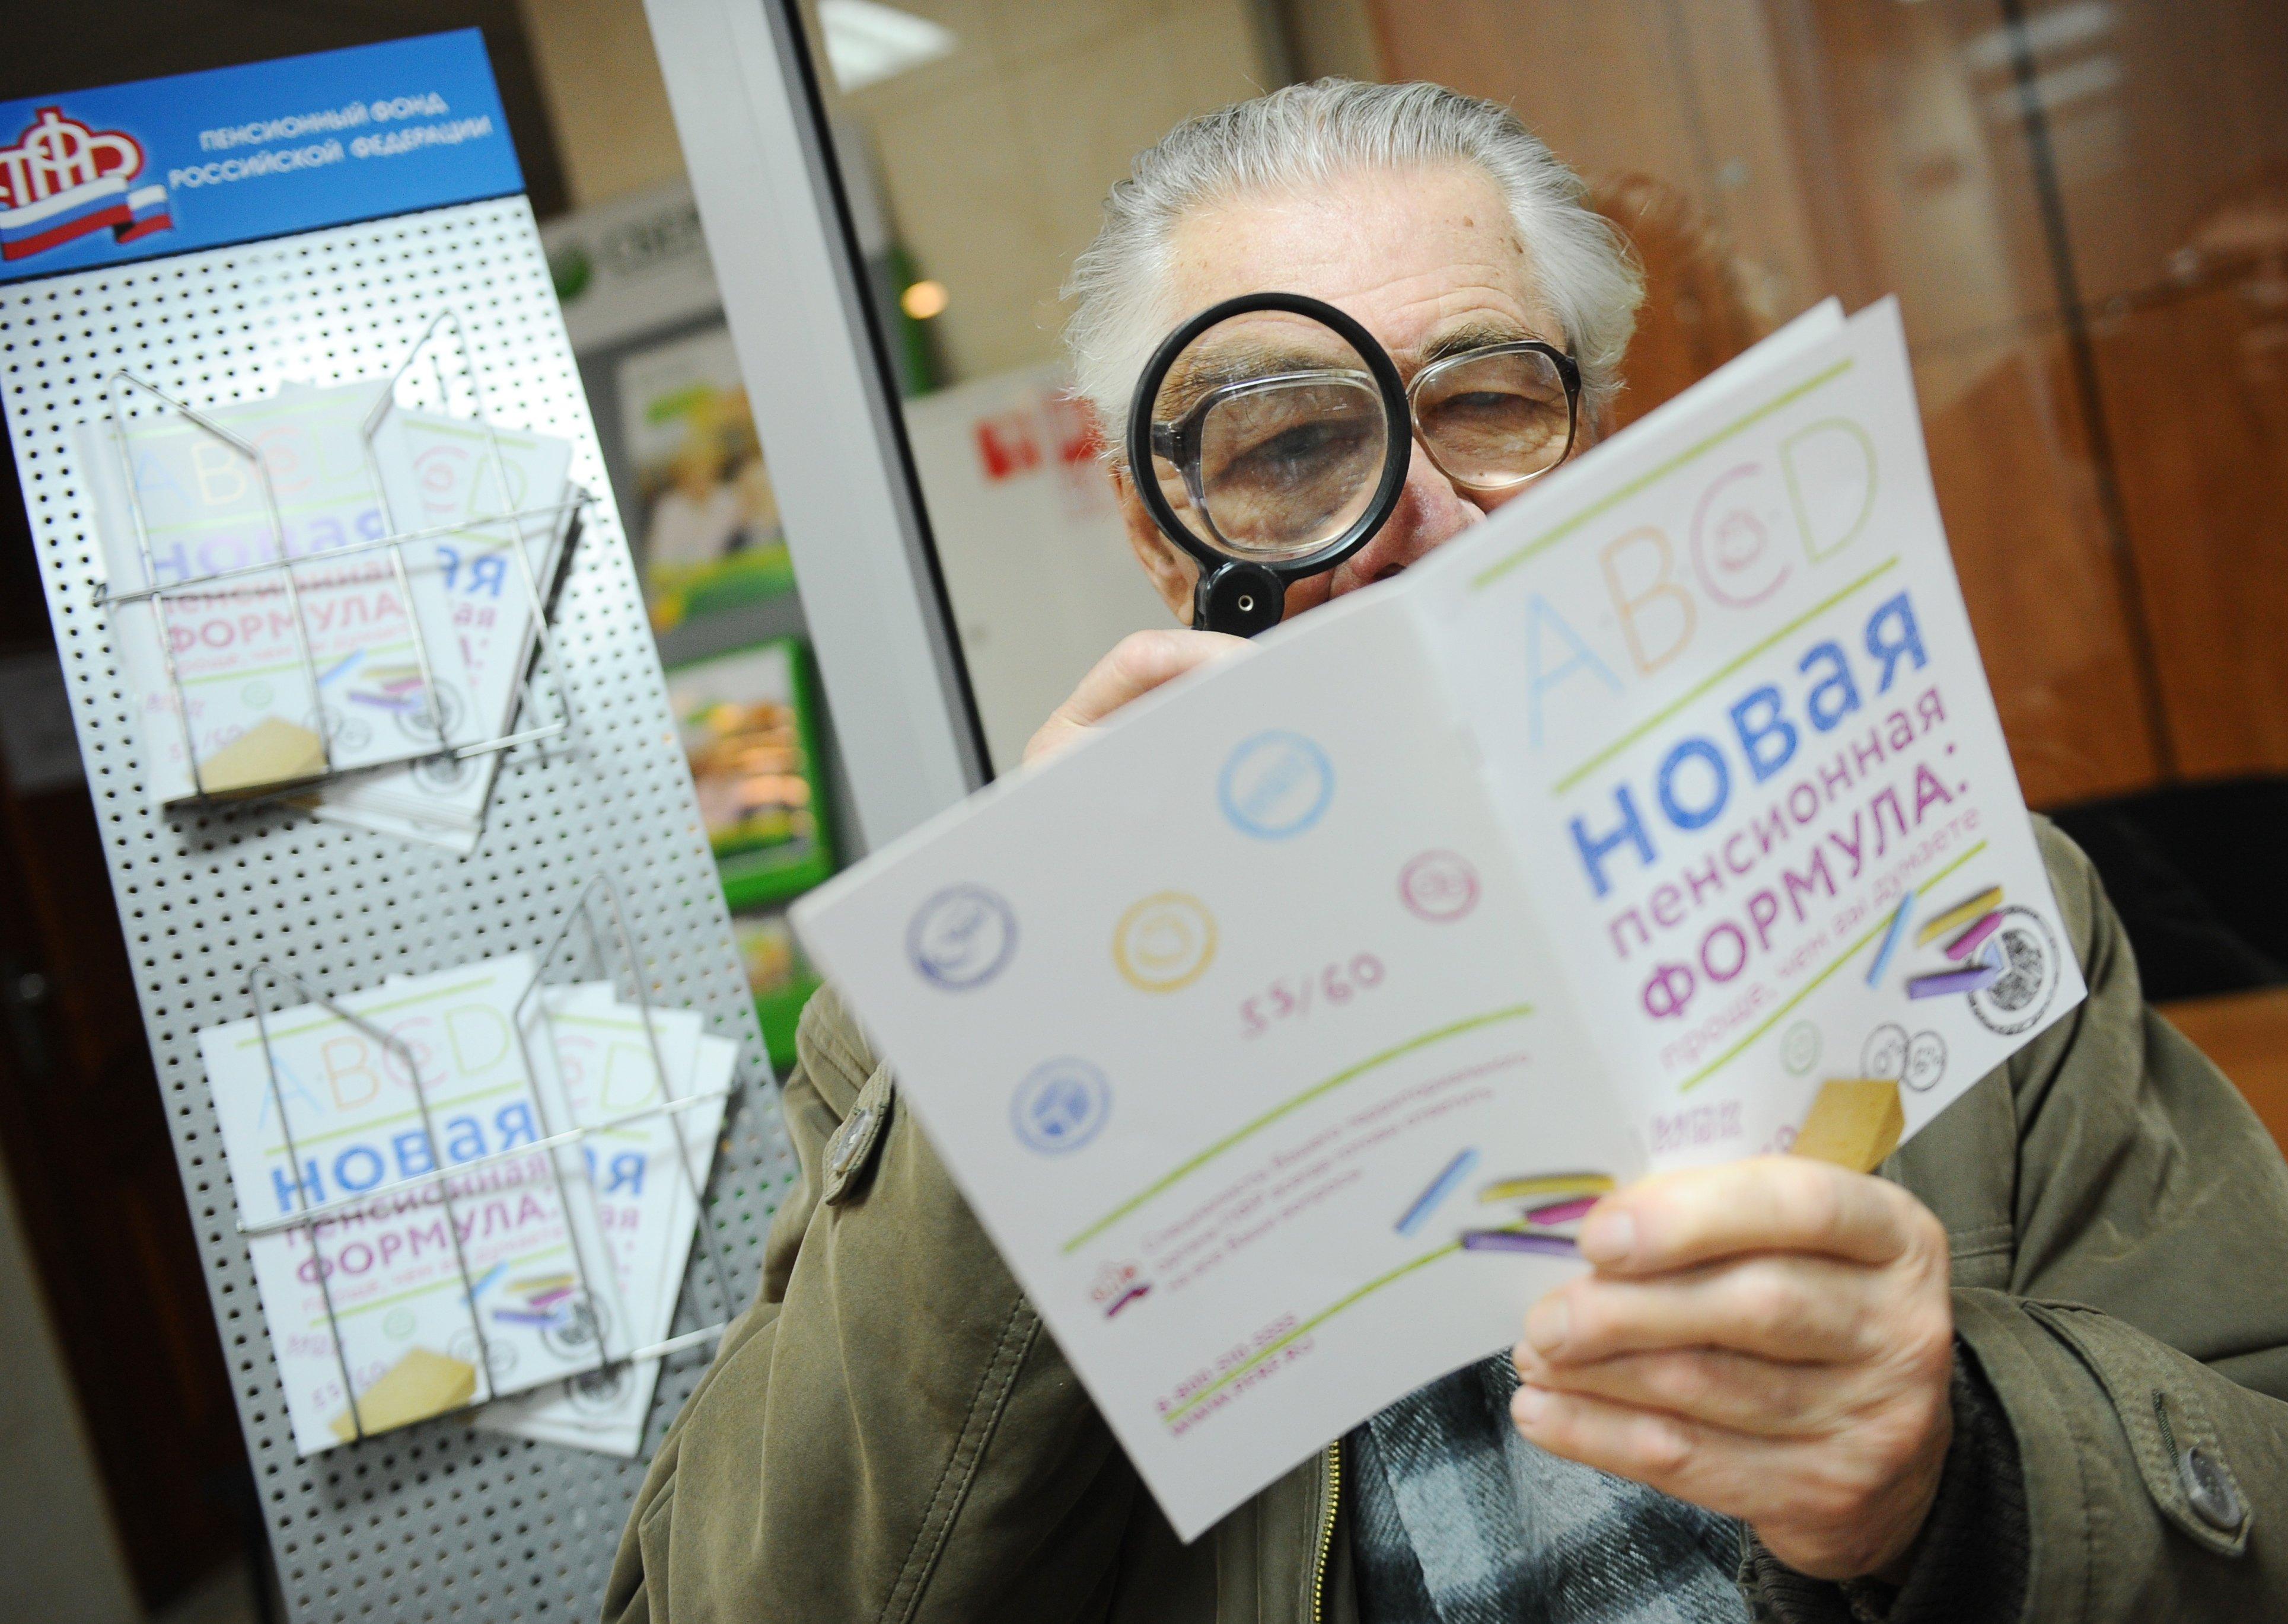 Как перевести пенсию на карту Сбербанка - Сравни. ру 39